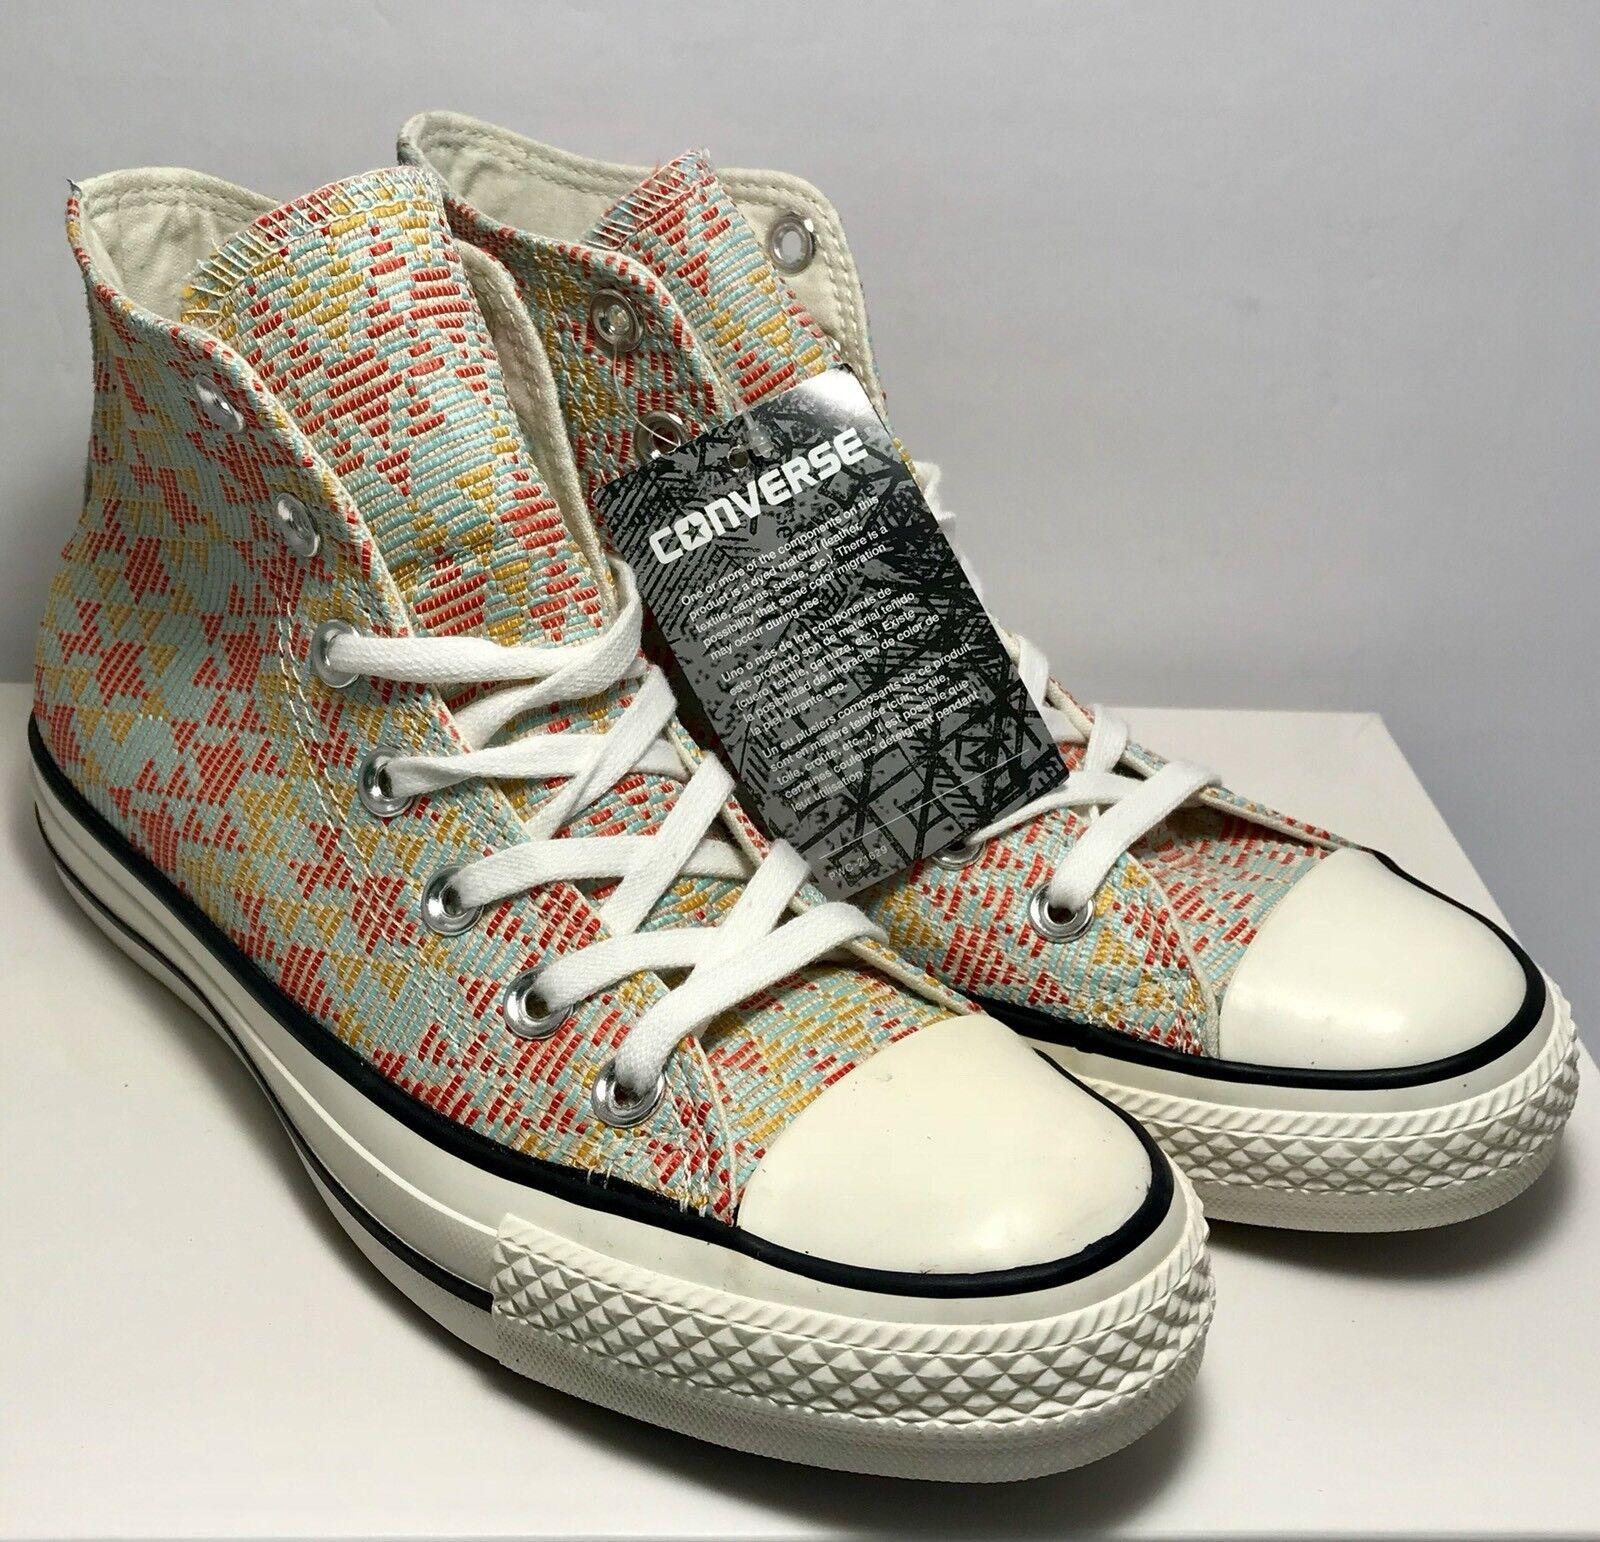 Converse Converse Converse para mujer Talla 7 Chuck Taylor All Star Hi Zapatos Tenis Tejido Natural  Más asequible